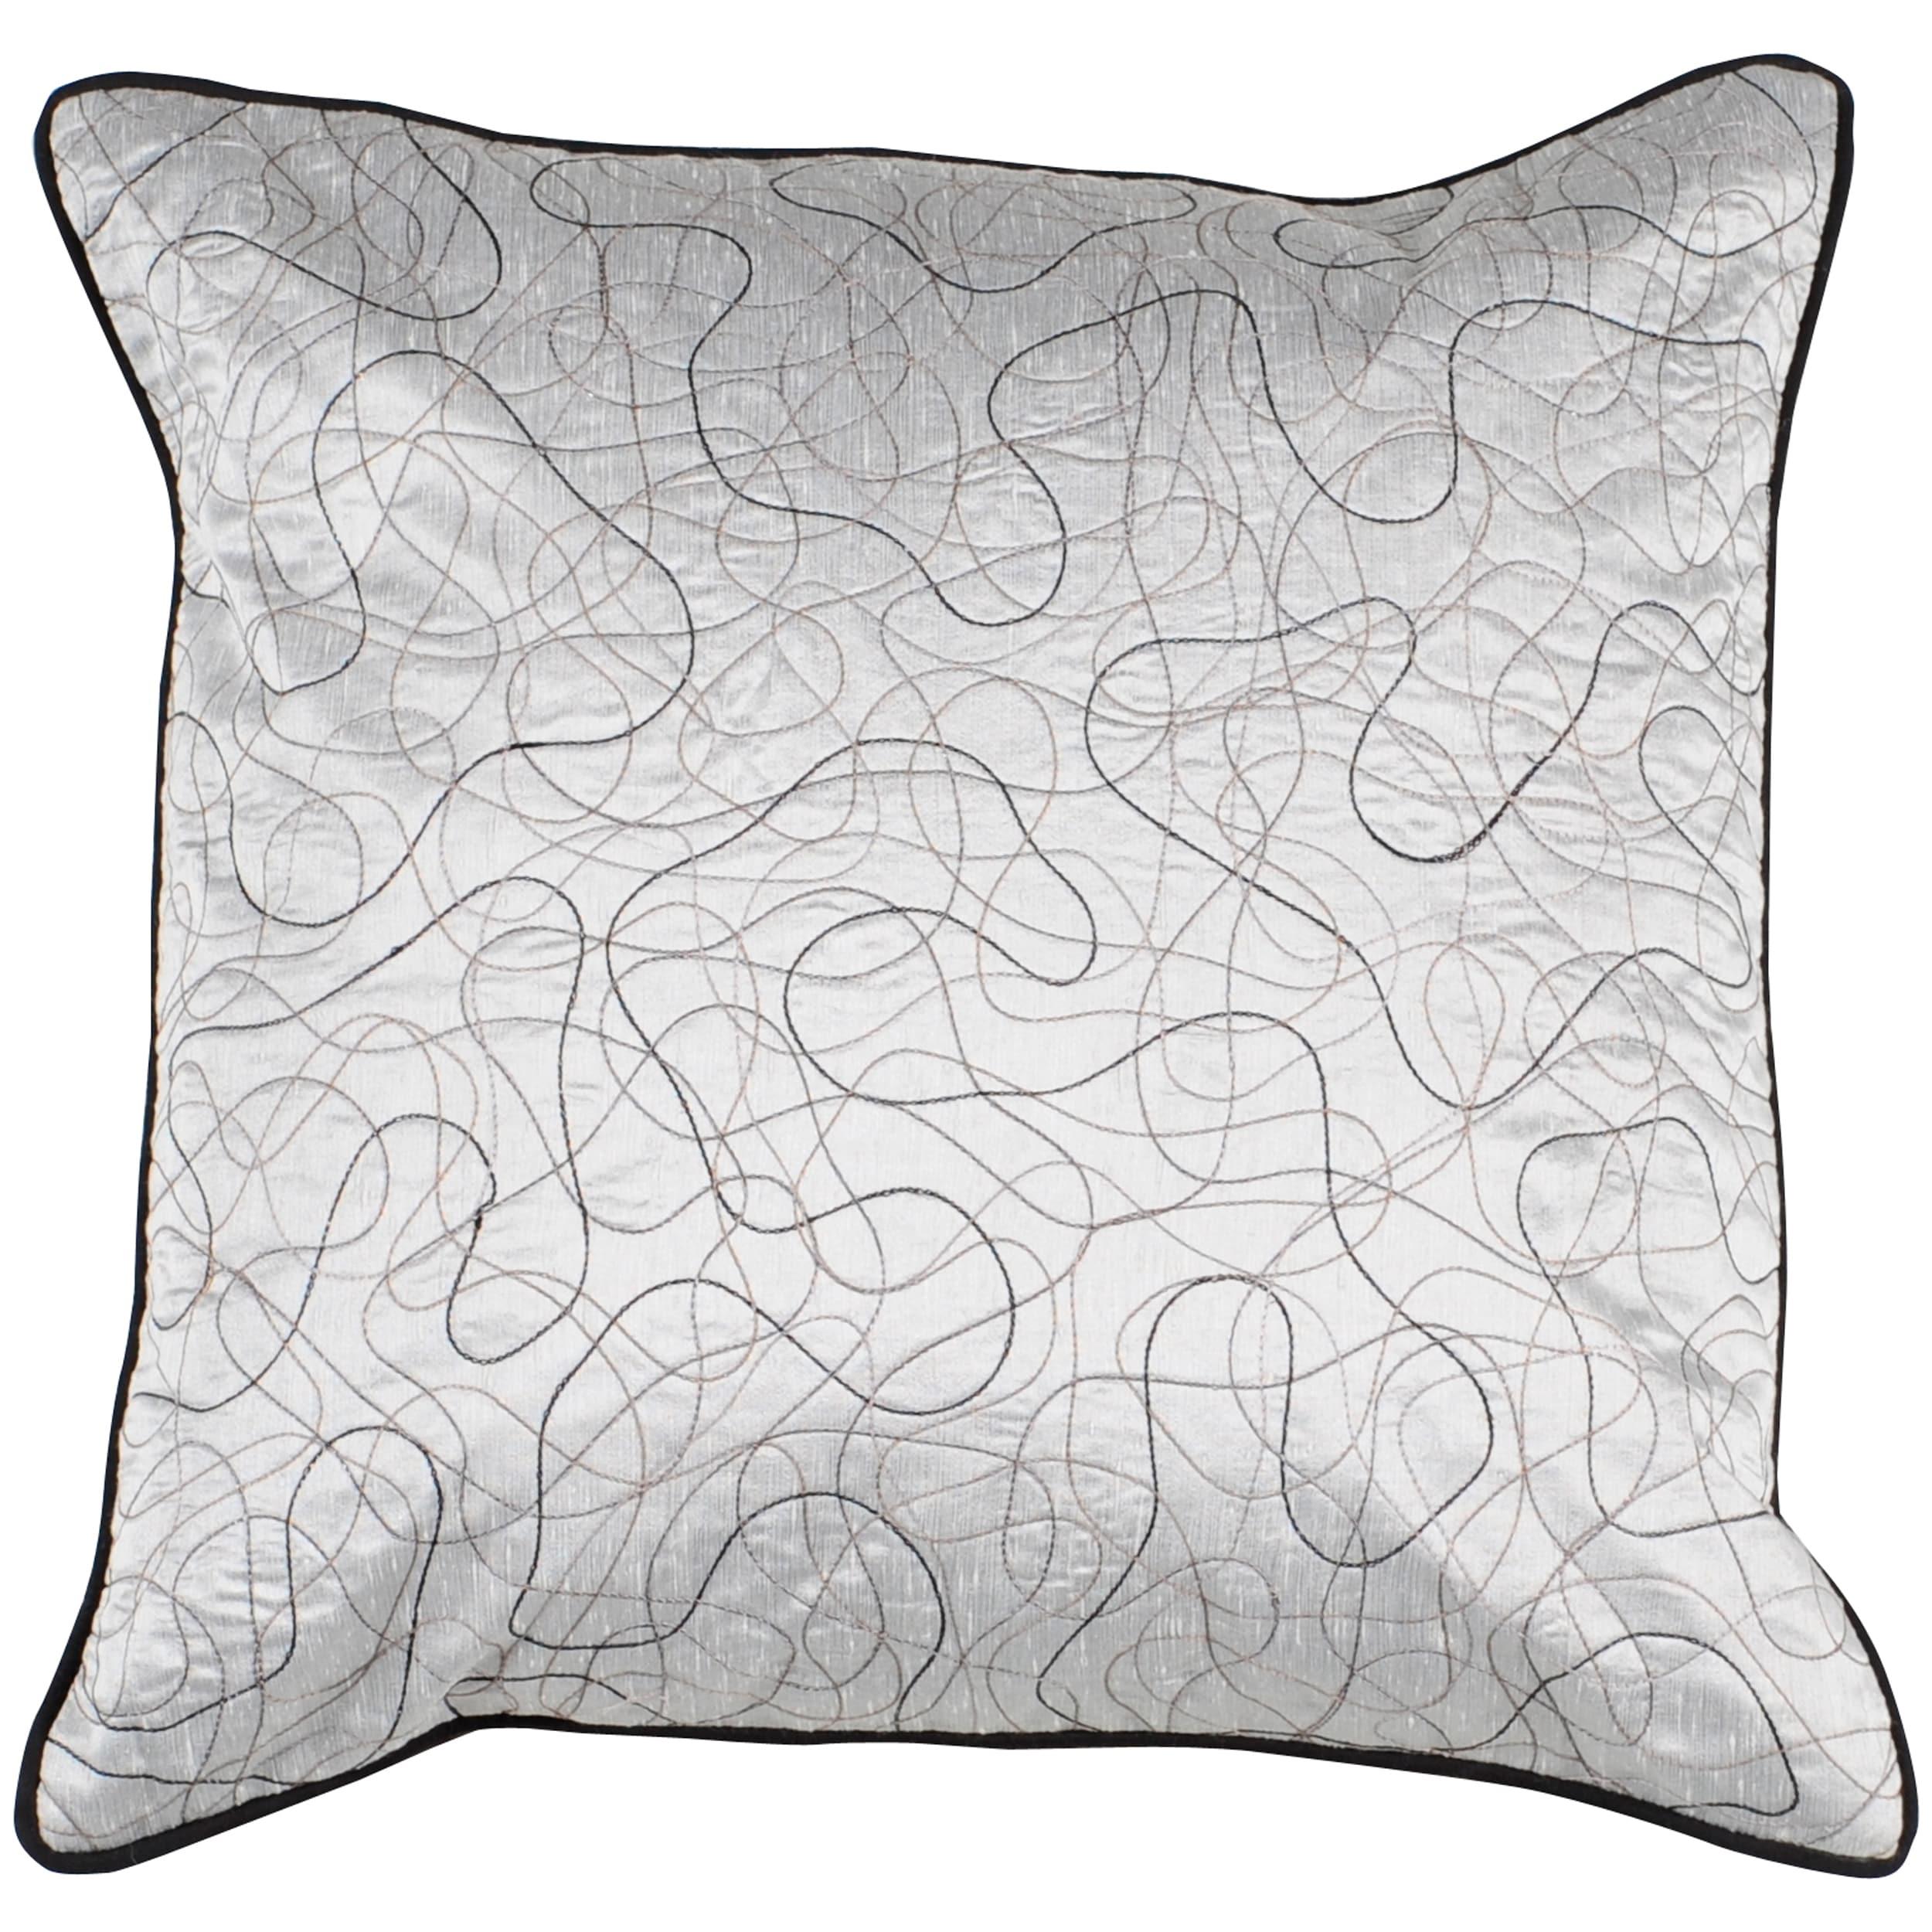 Decorative Topstitched Pro Pillow